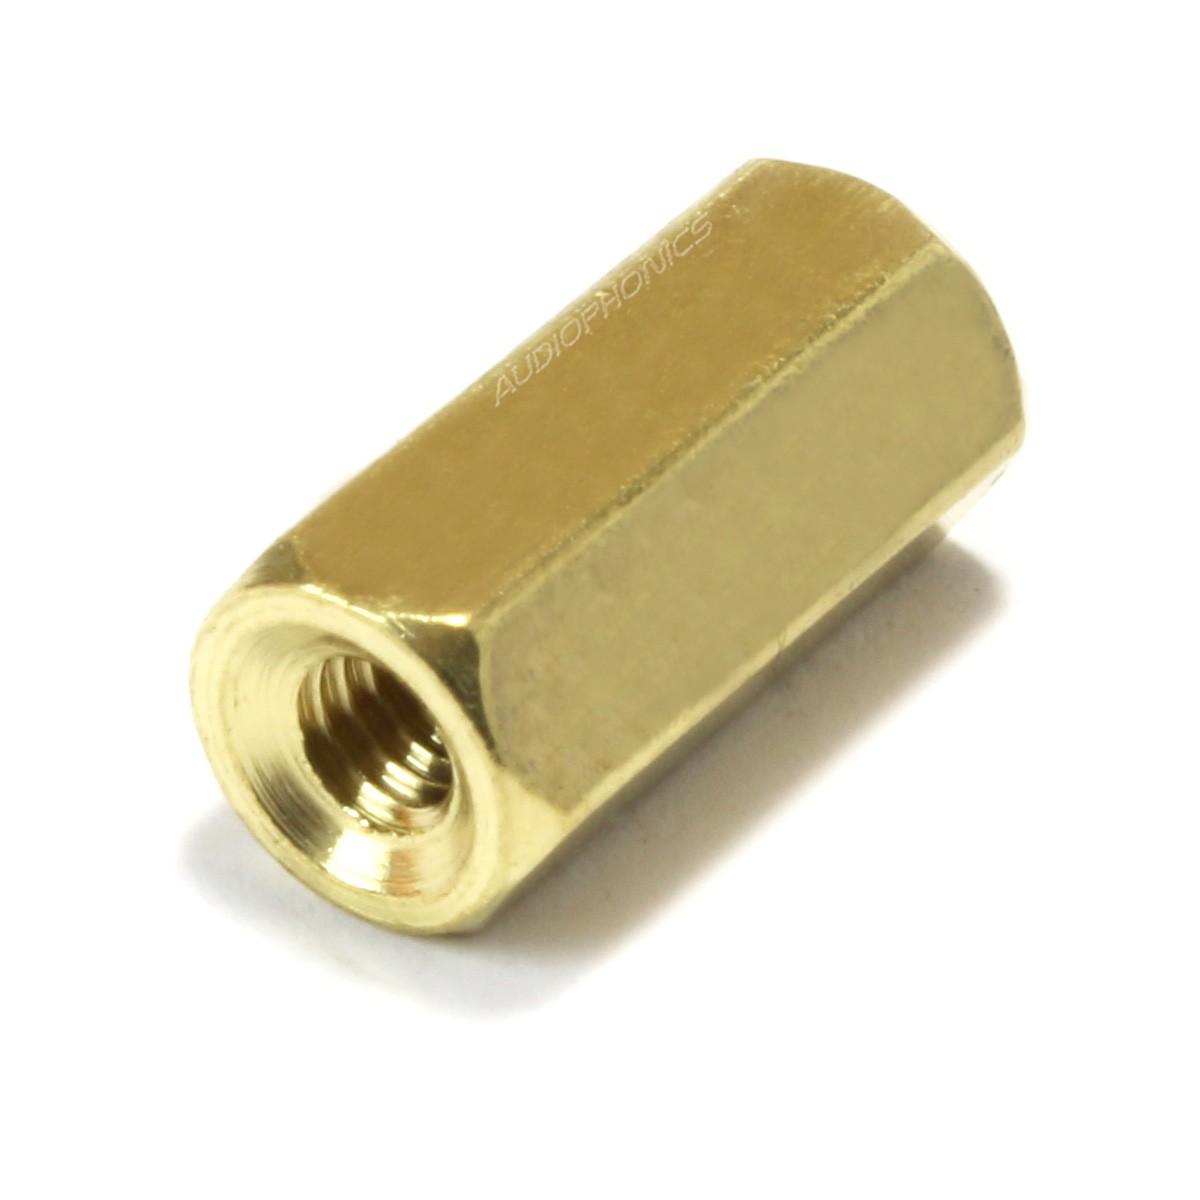 Entretoises Laiton Femelle / Femelle M2.5x10mm (x10)